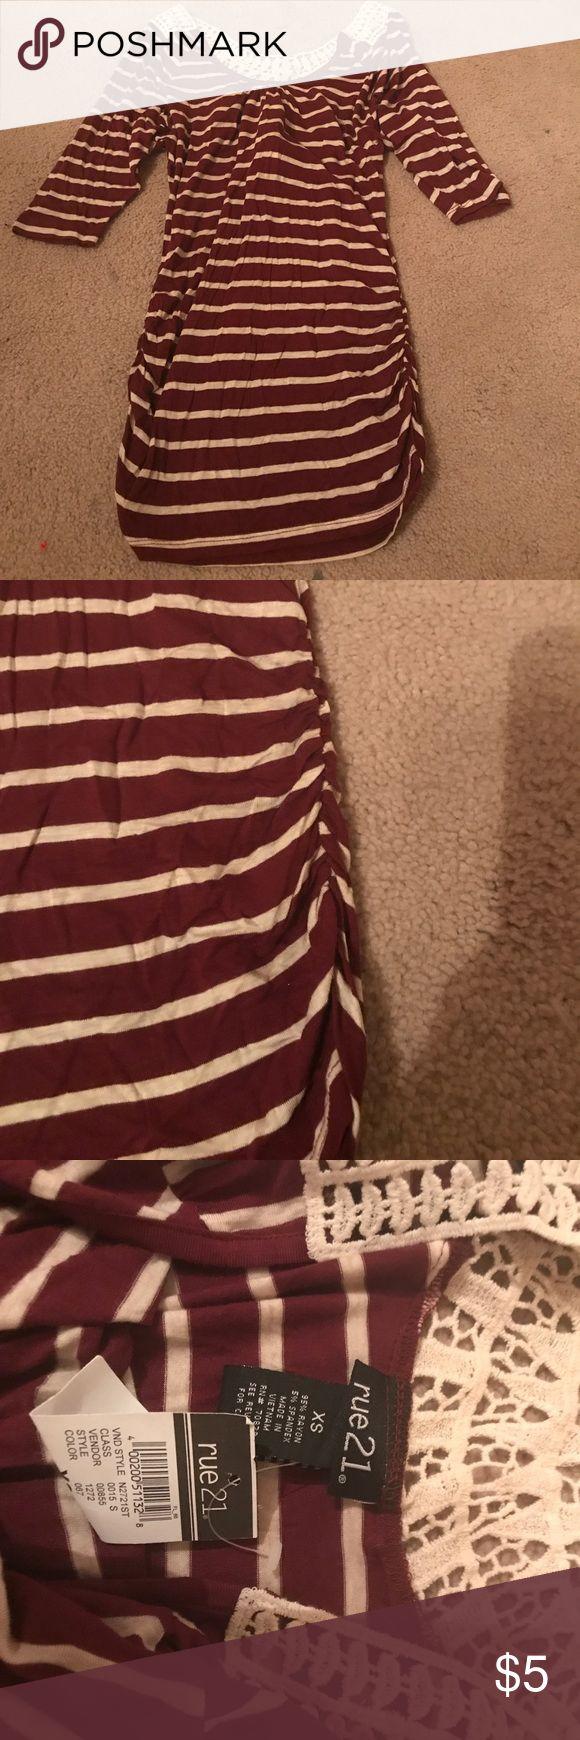 NWT Rue 21 burgundy & cream striped with crotchet NWT Rue 21 XS burgundy & cream striped with crotchet back Rue 21 Tops Tees - Short Sleeve